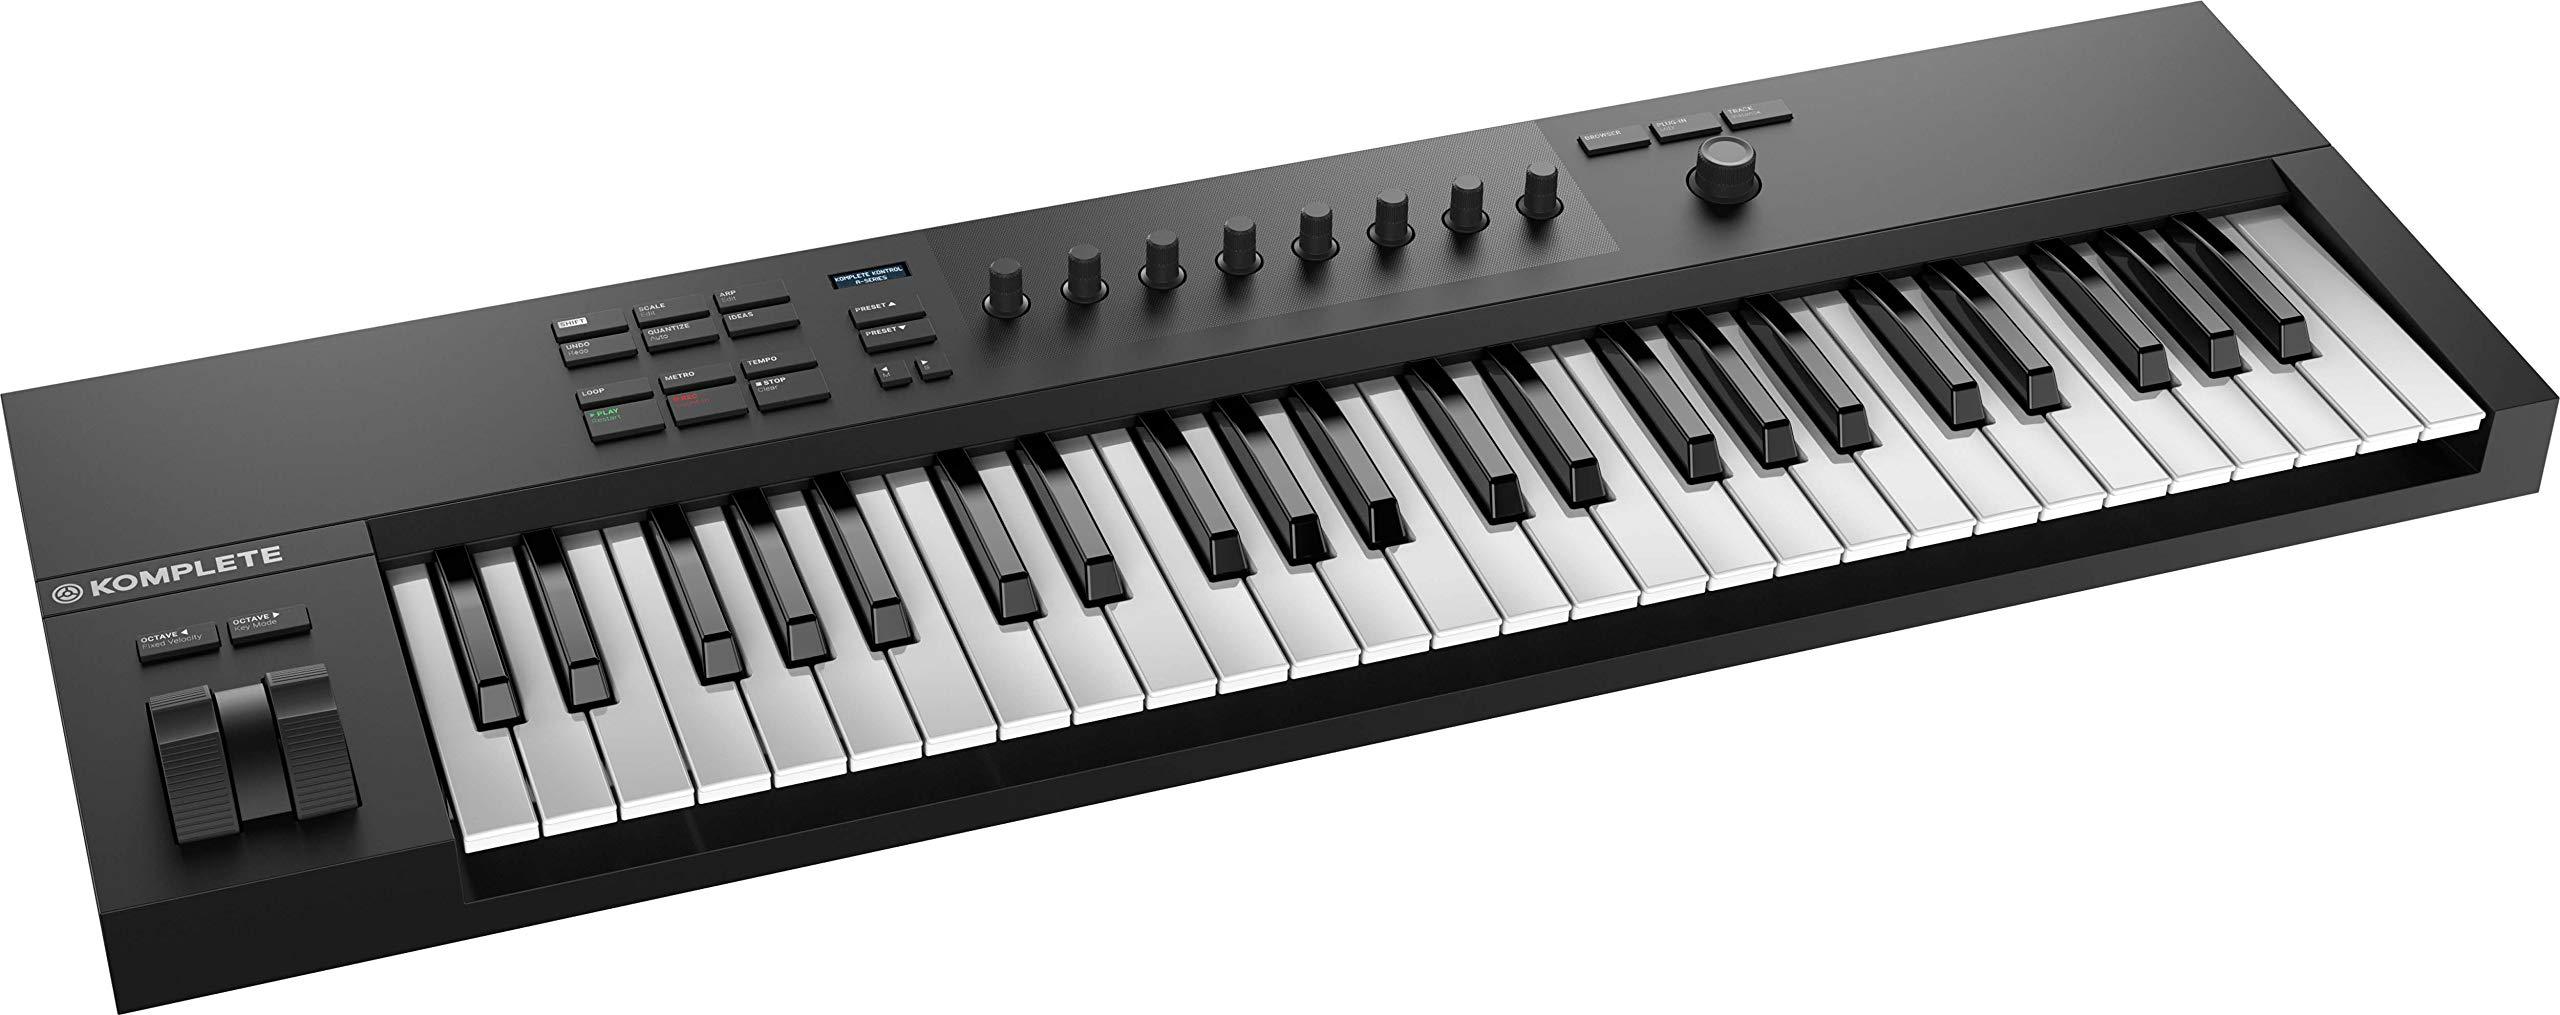 Native Instruments Komplete Kontrol A49 Controller Keyboard